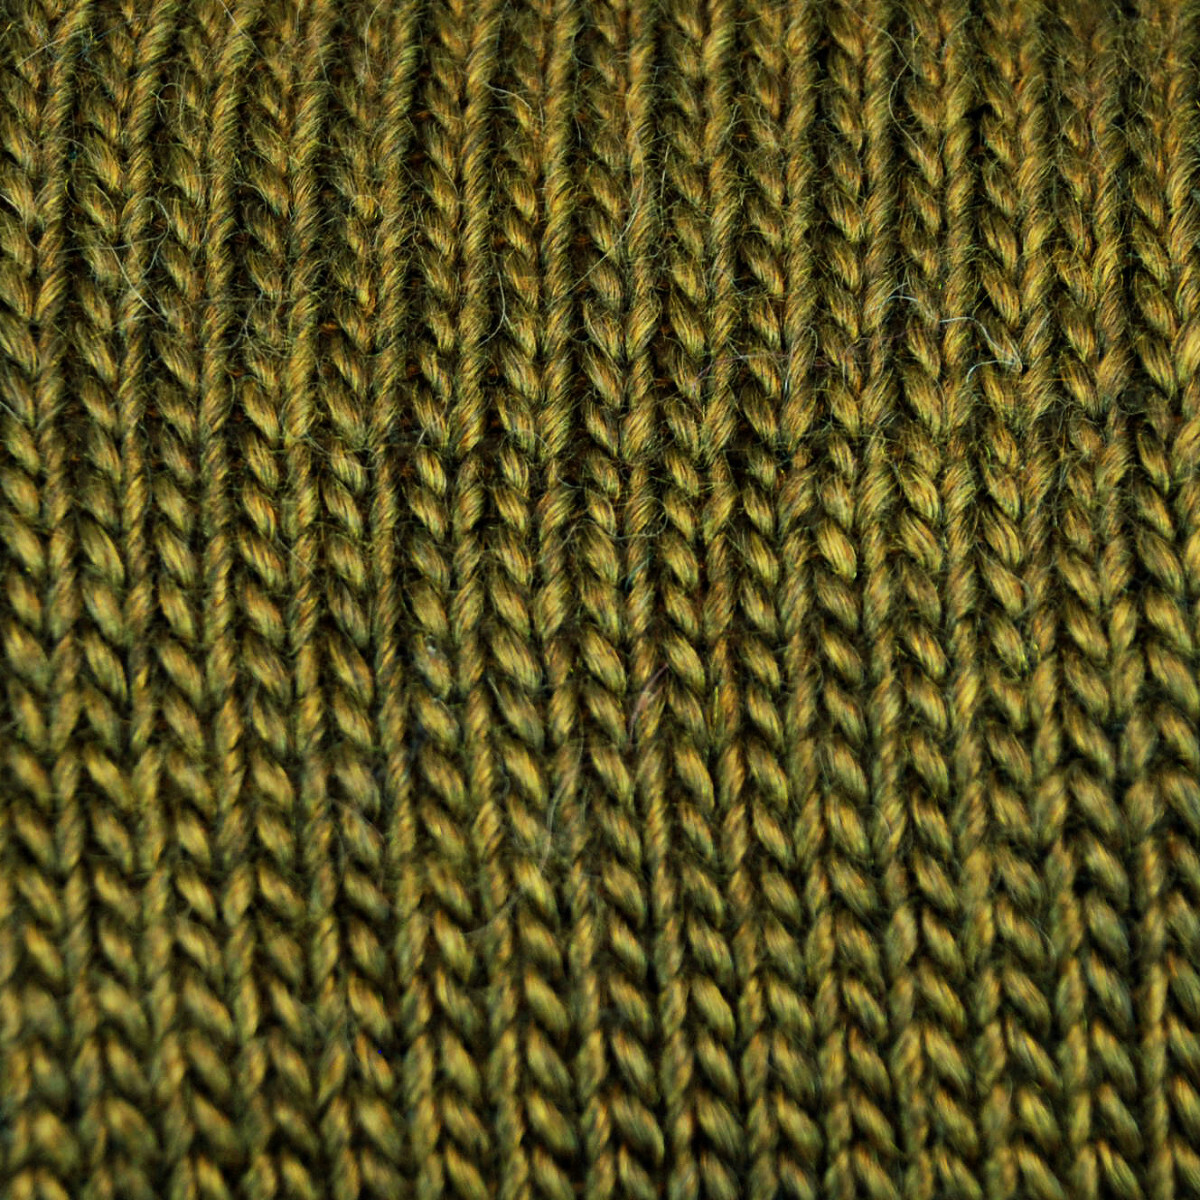 Astral Yarn - Gold Rush